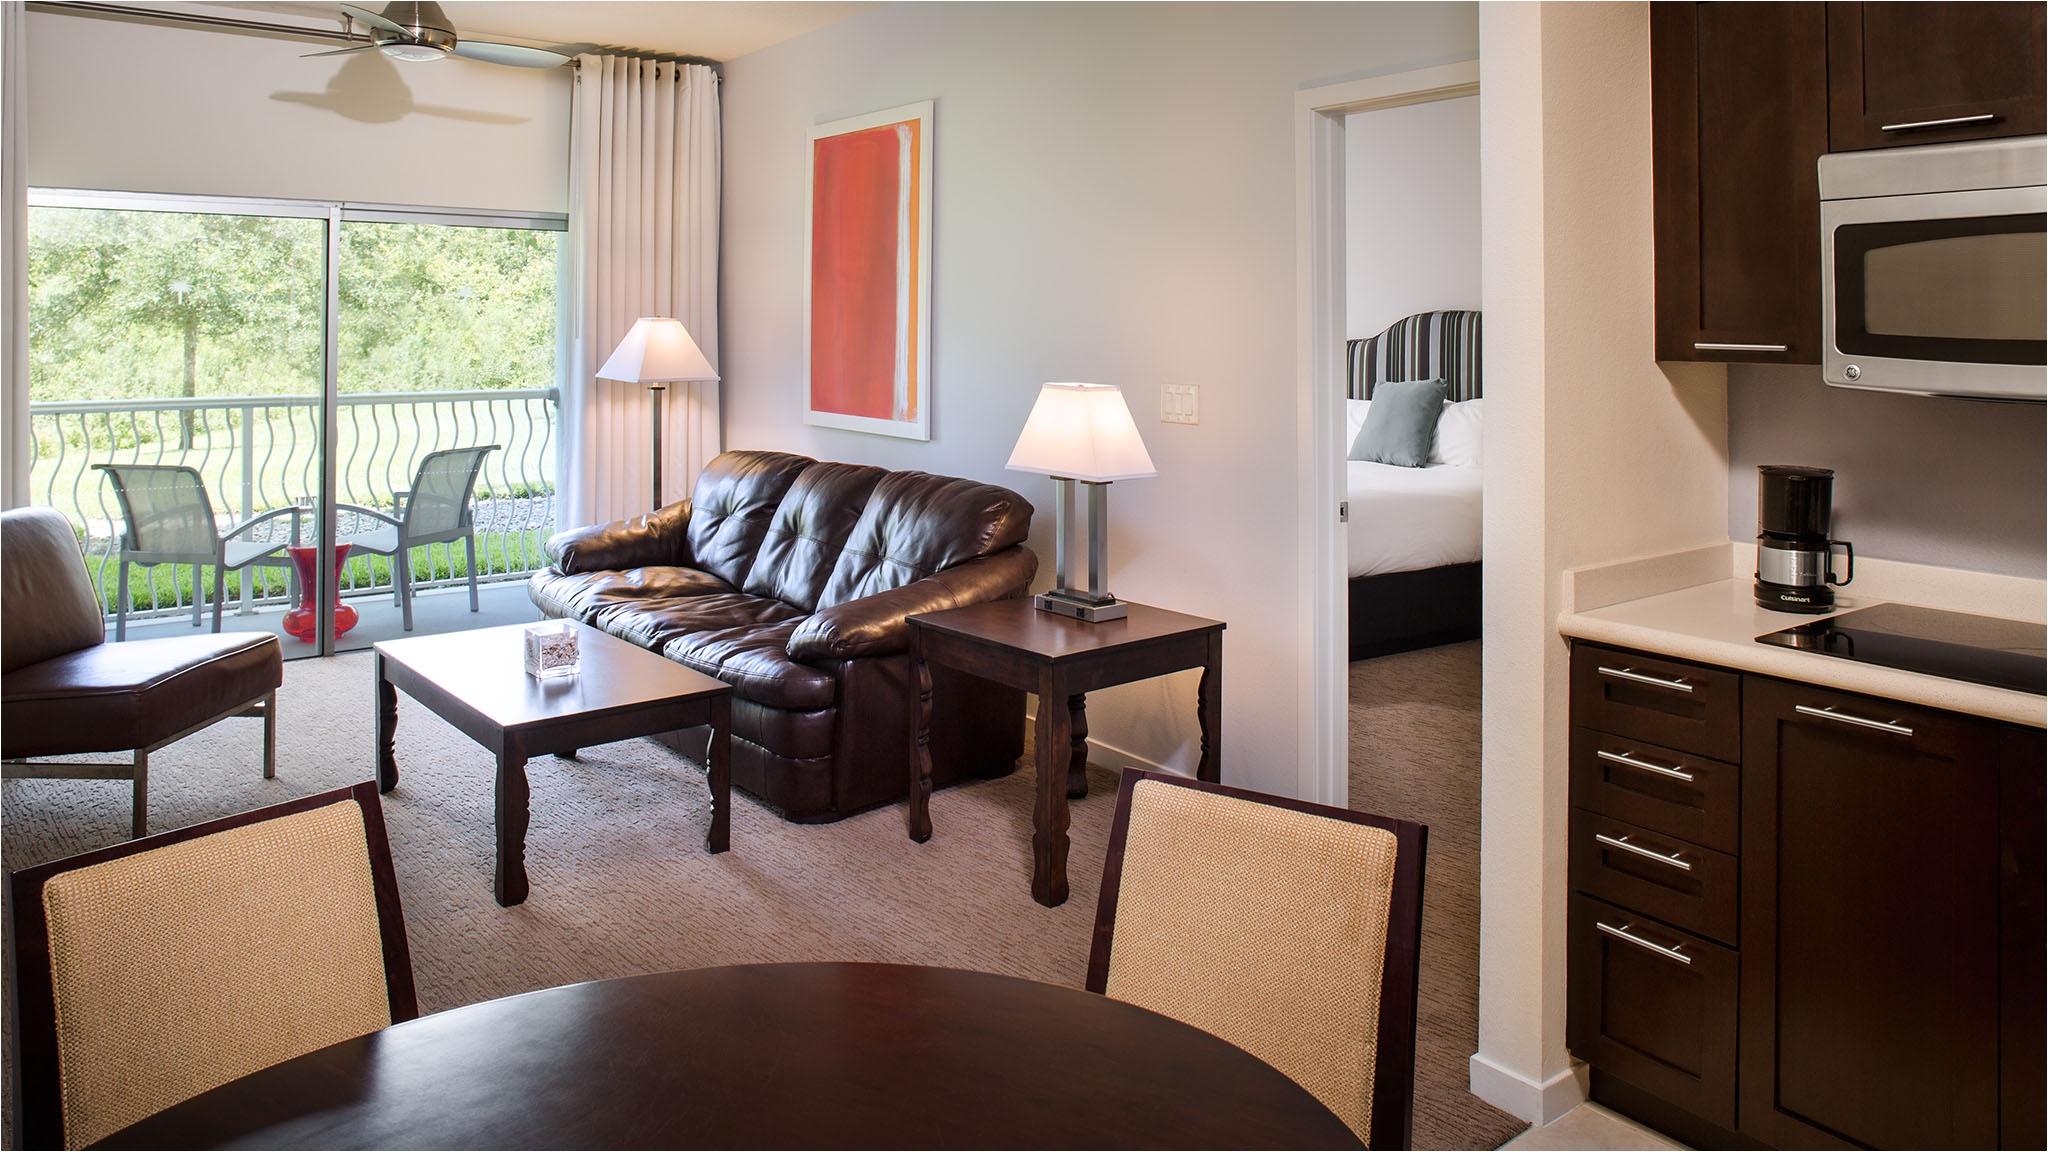 High Quality Orlando Hotel With Kitchen Vojnikinfo Homewood Suites Orlando